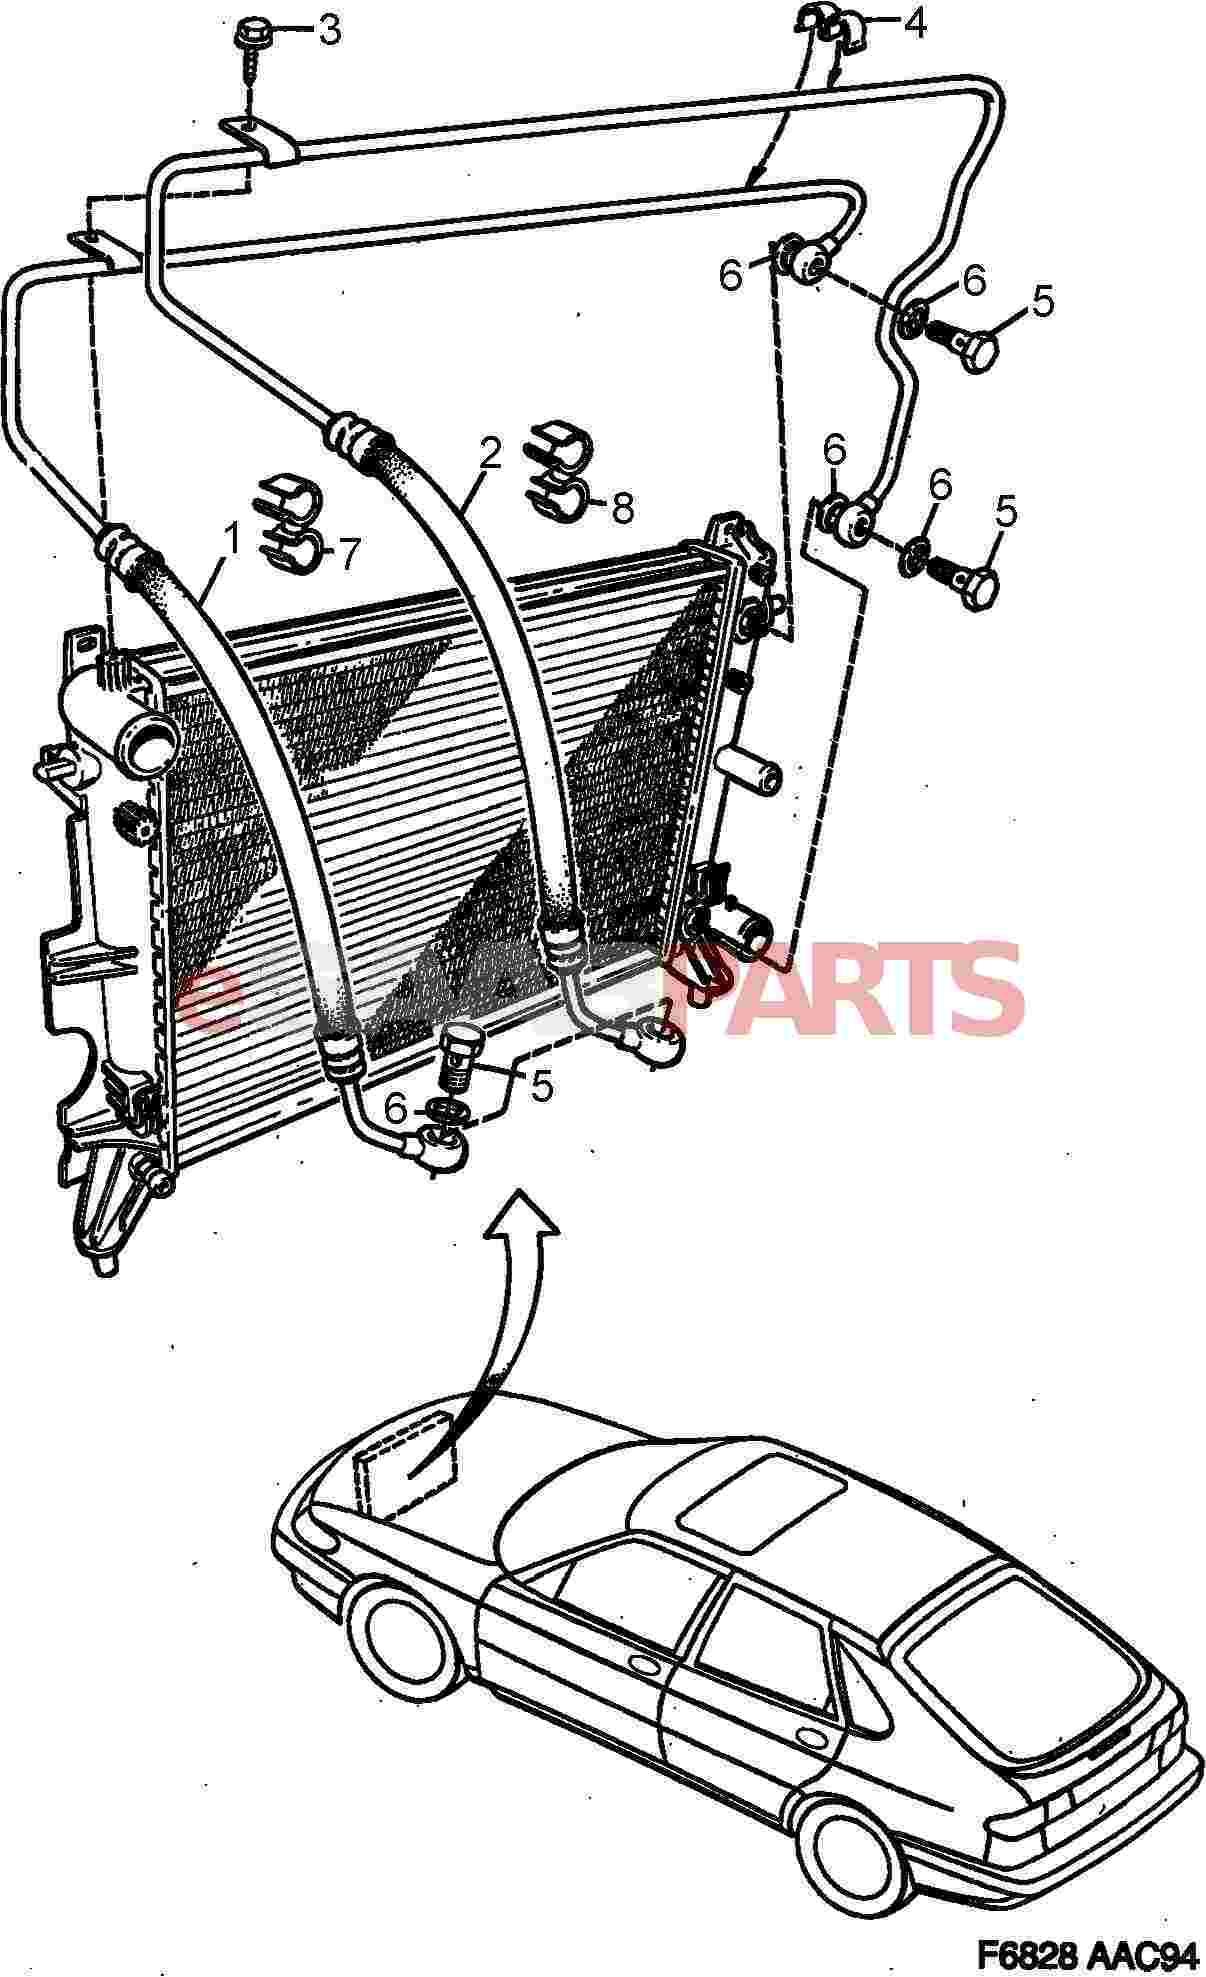 Saab 900 Transmission Part Diagram Engine Diagram And